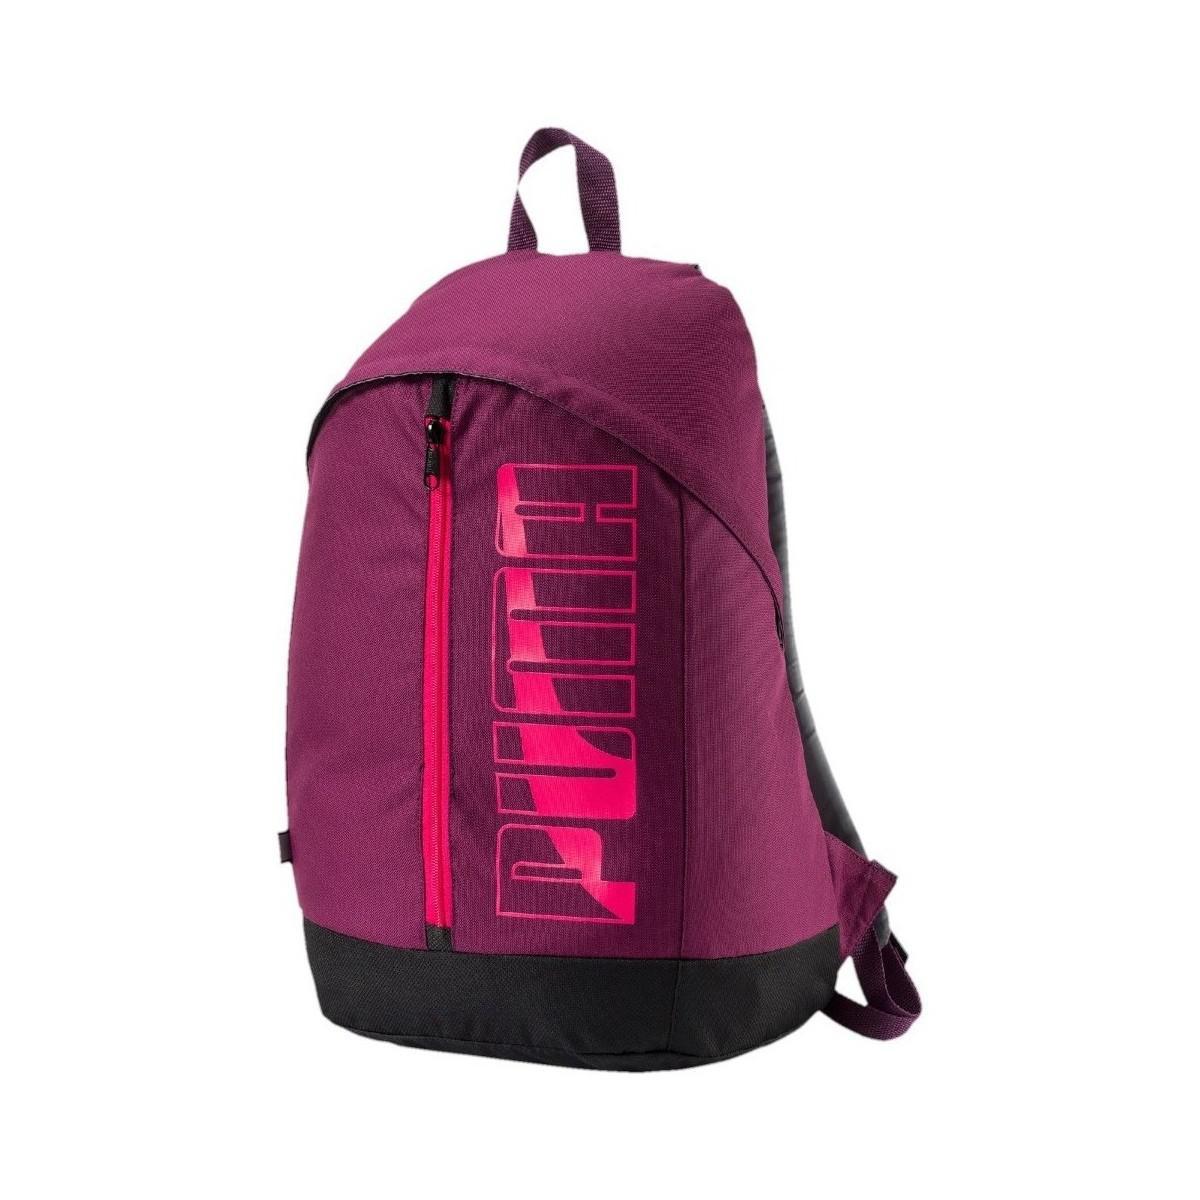 65e74d8ab73 PUMA Pioneer Backpack Ii Women's Backpack In Purple in Purple for ...